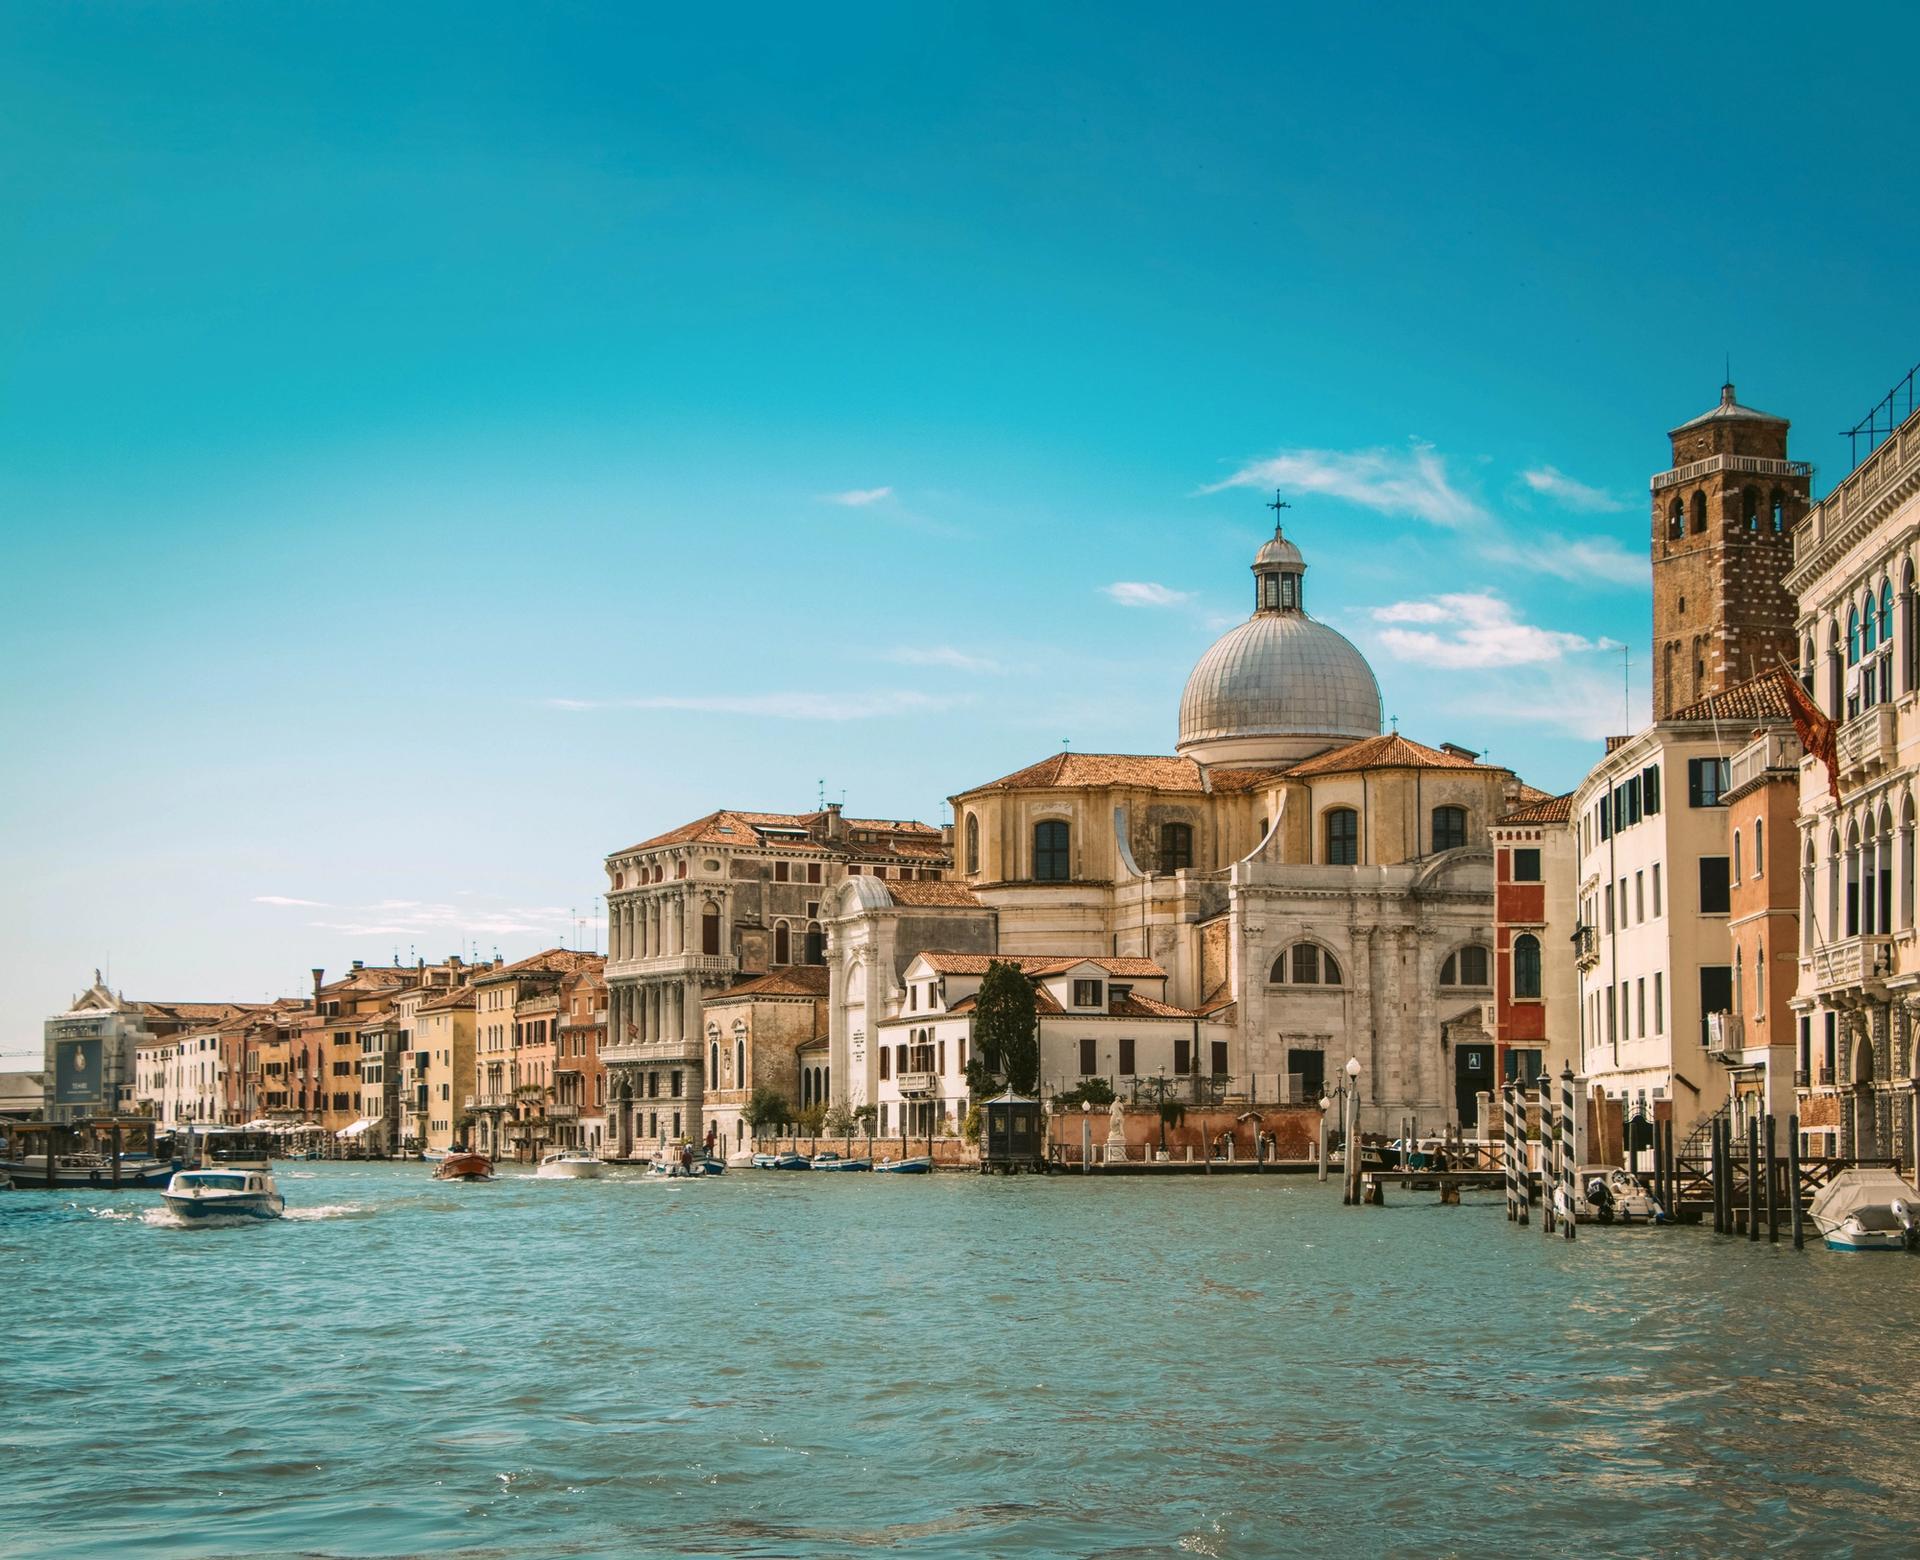 Venice Photo: Jayakody Anthanas via Unsplash